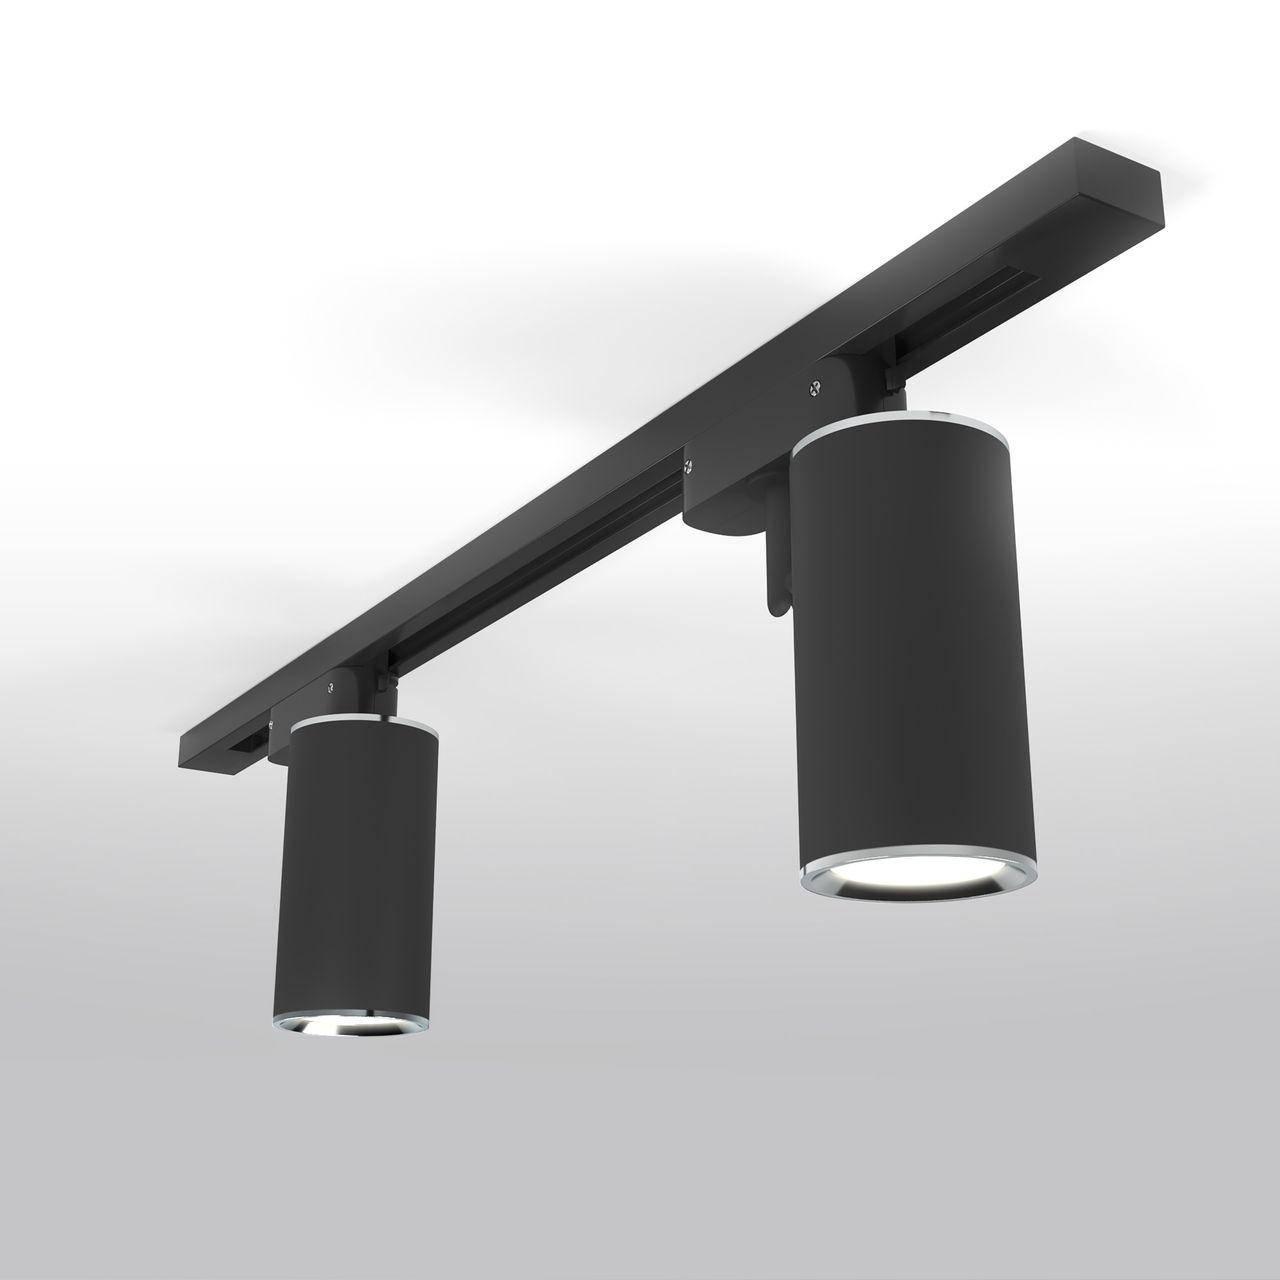 MRL 1002 / Светильник потолочный Rutero GU10 черный